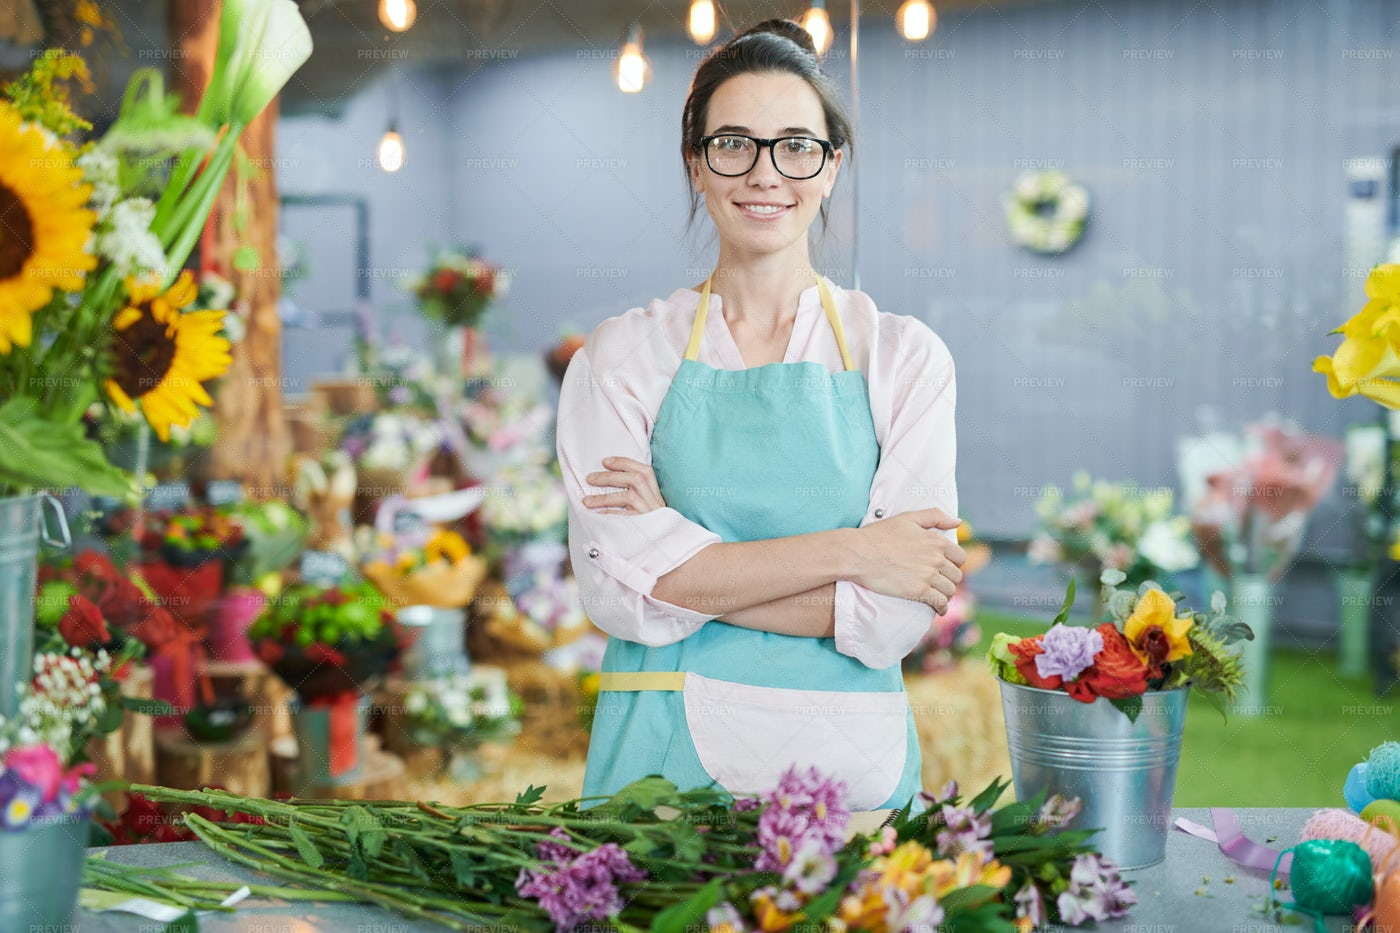 Woman Posing In Flower Shop: Stock Photos